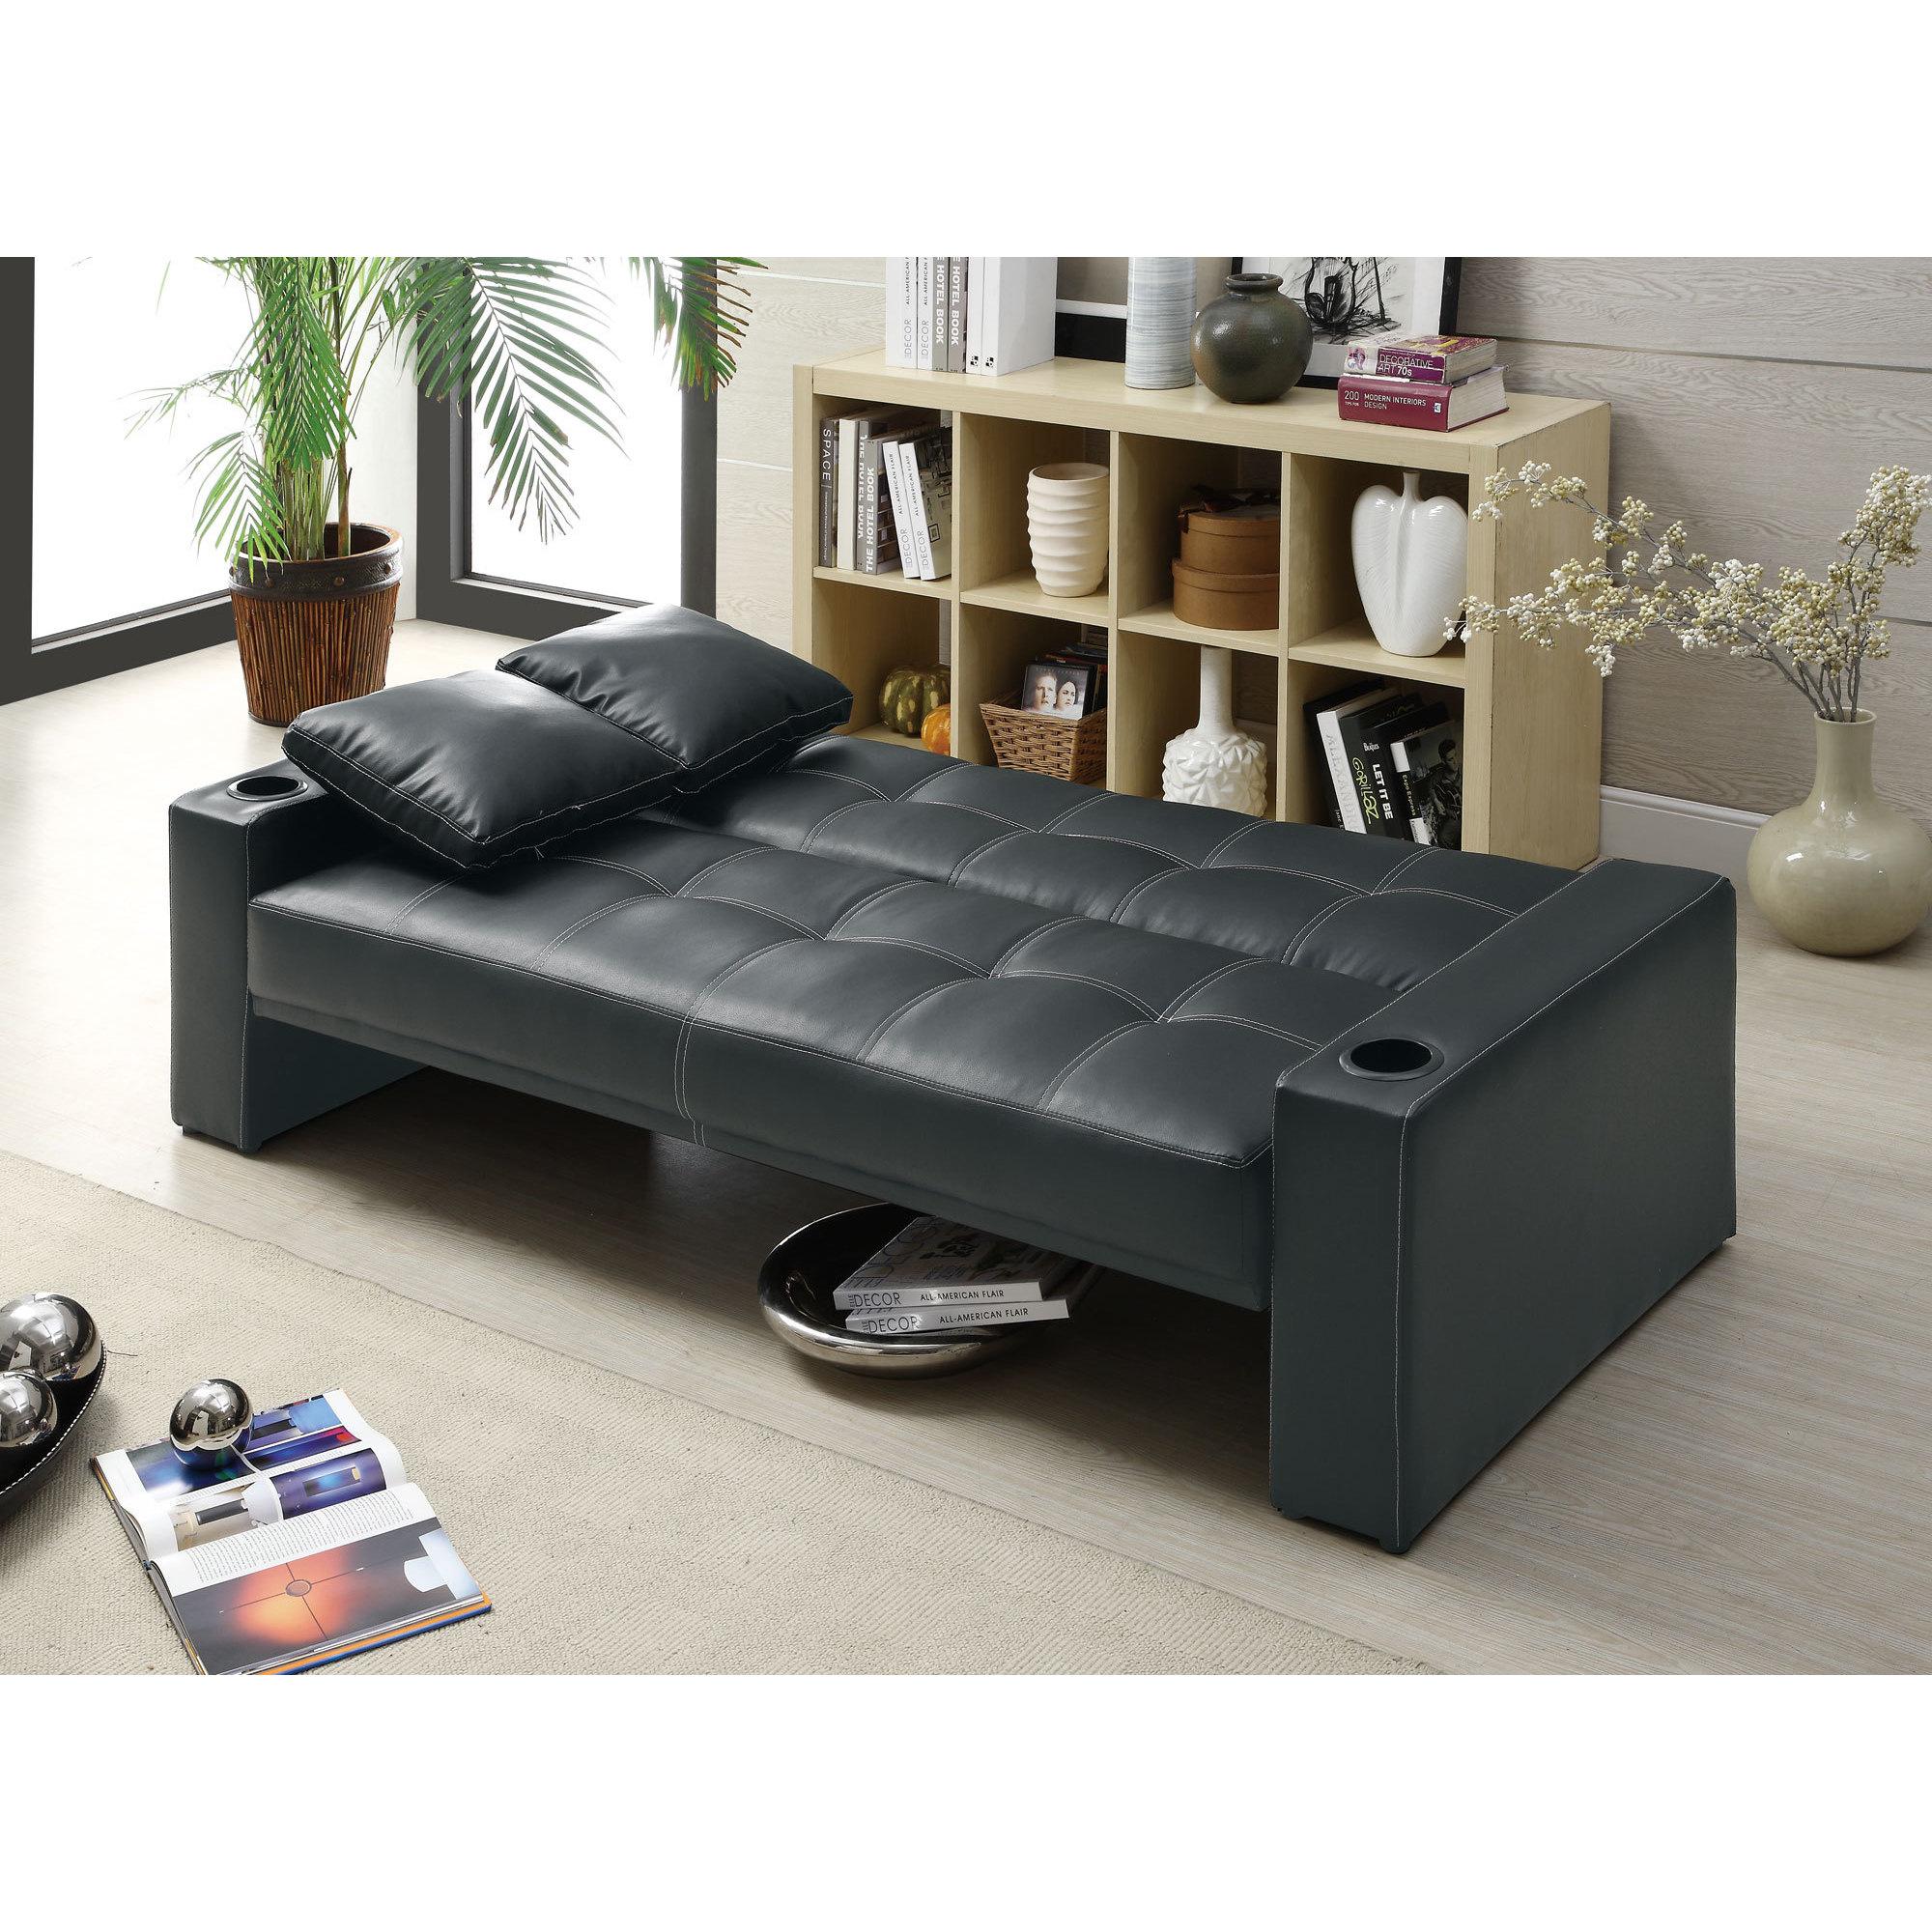 Coaster Company Black Sofa Bed On Free Shipping Today 12529330